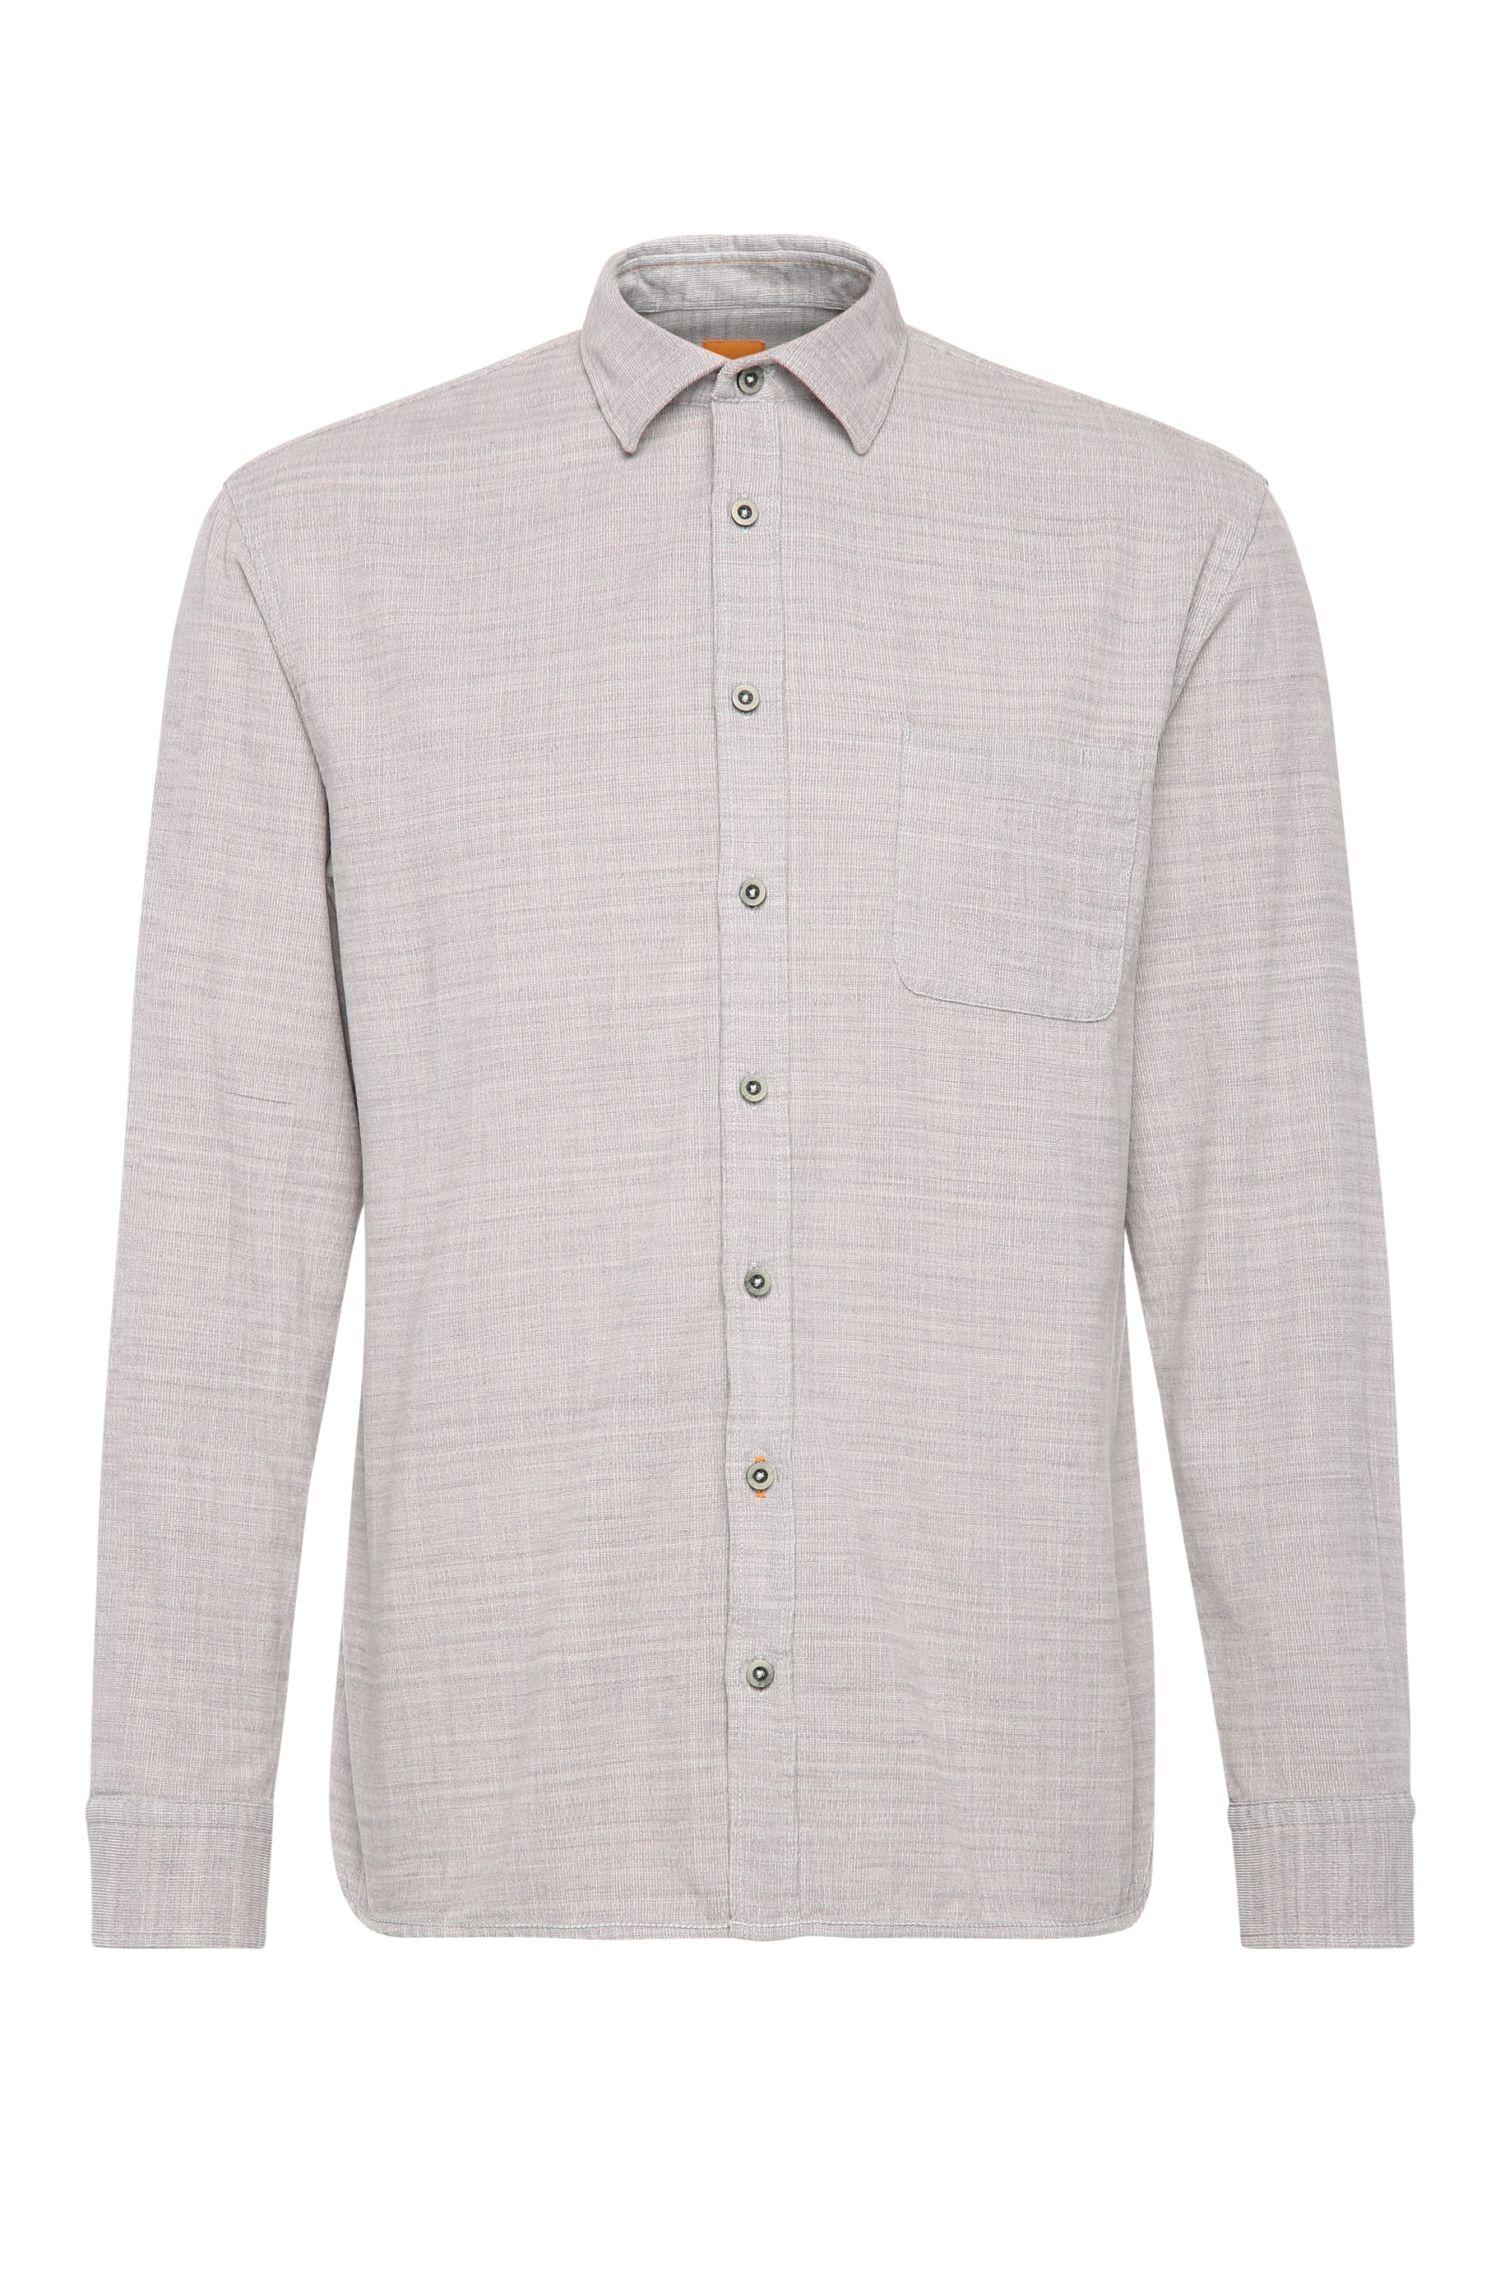 Relaxed-Fit Hemd aus strukturierter Baumwolle: ´ElooseE`